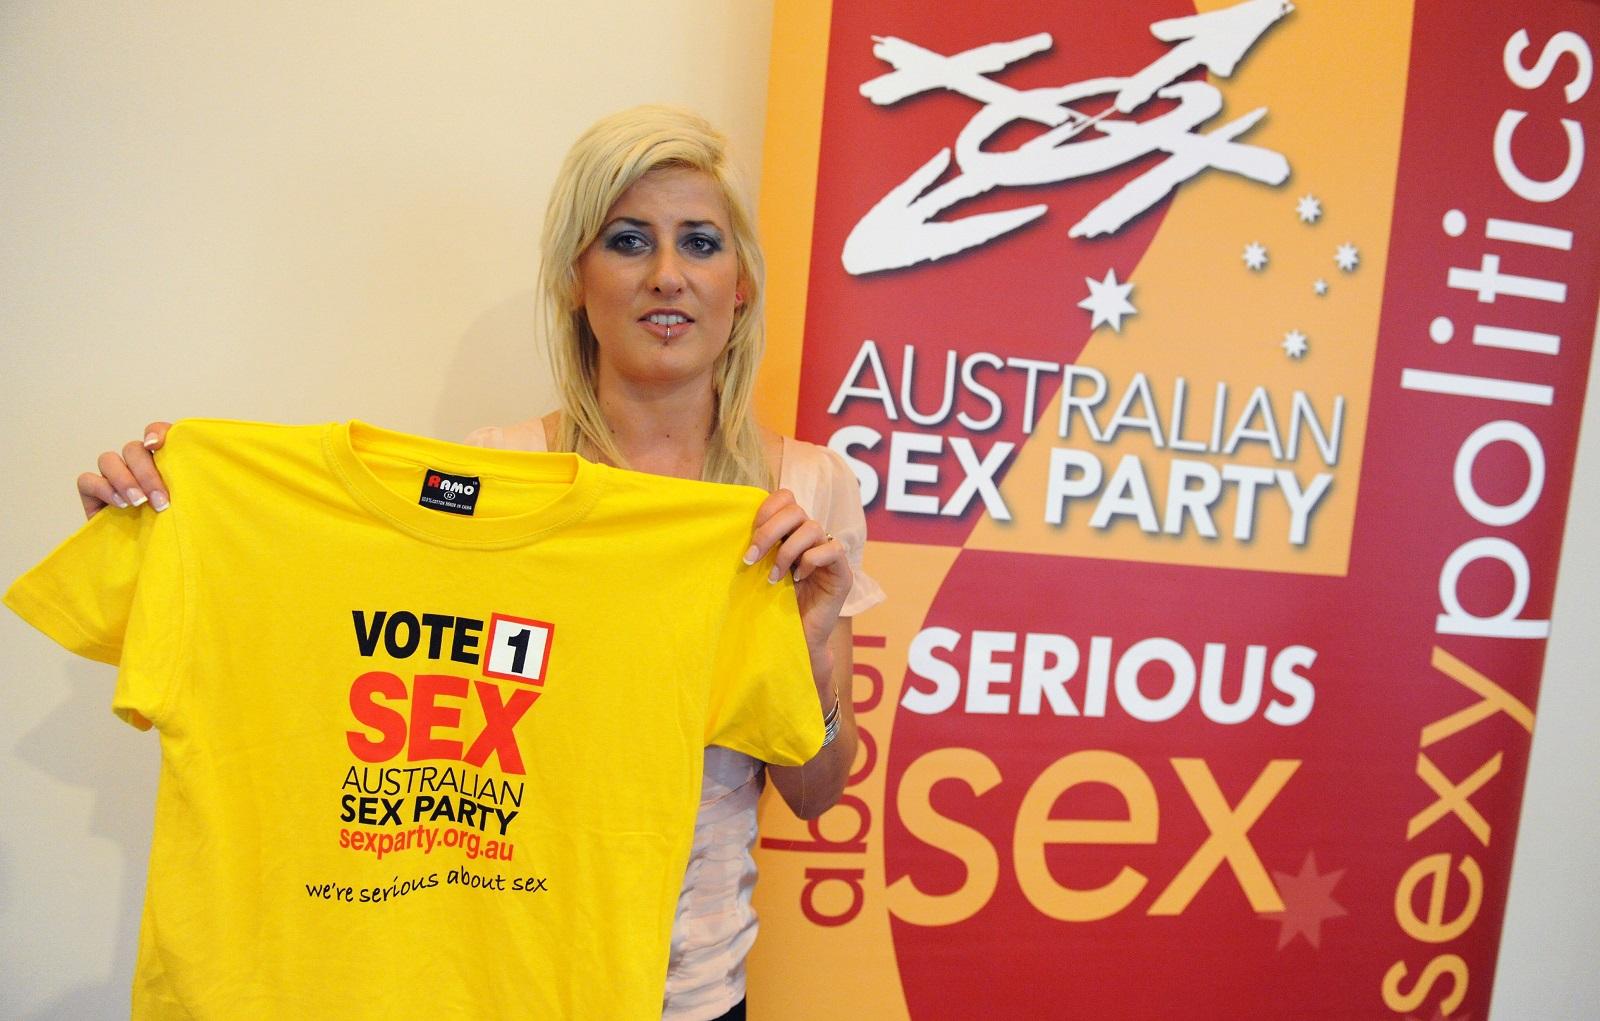 Australian sex party deregistered